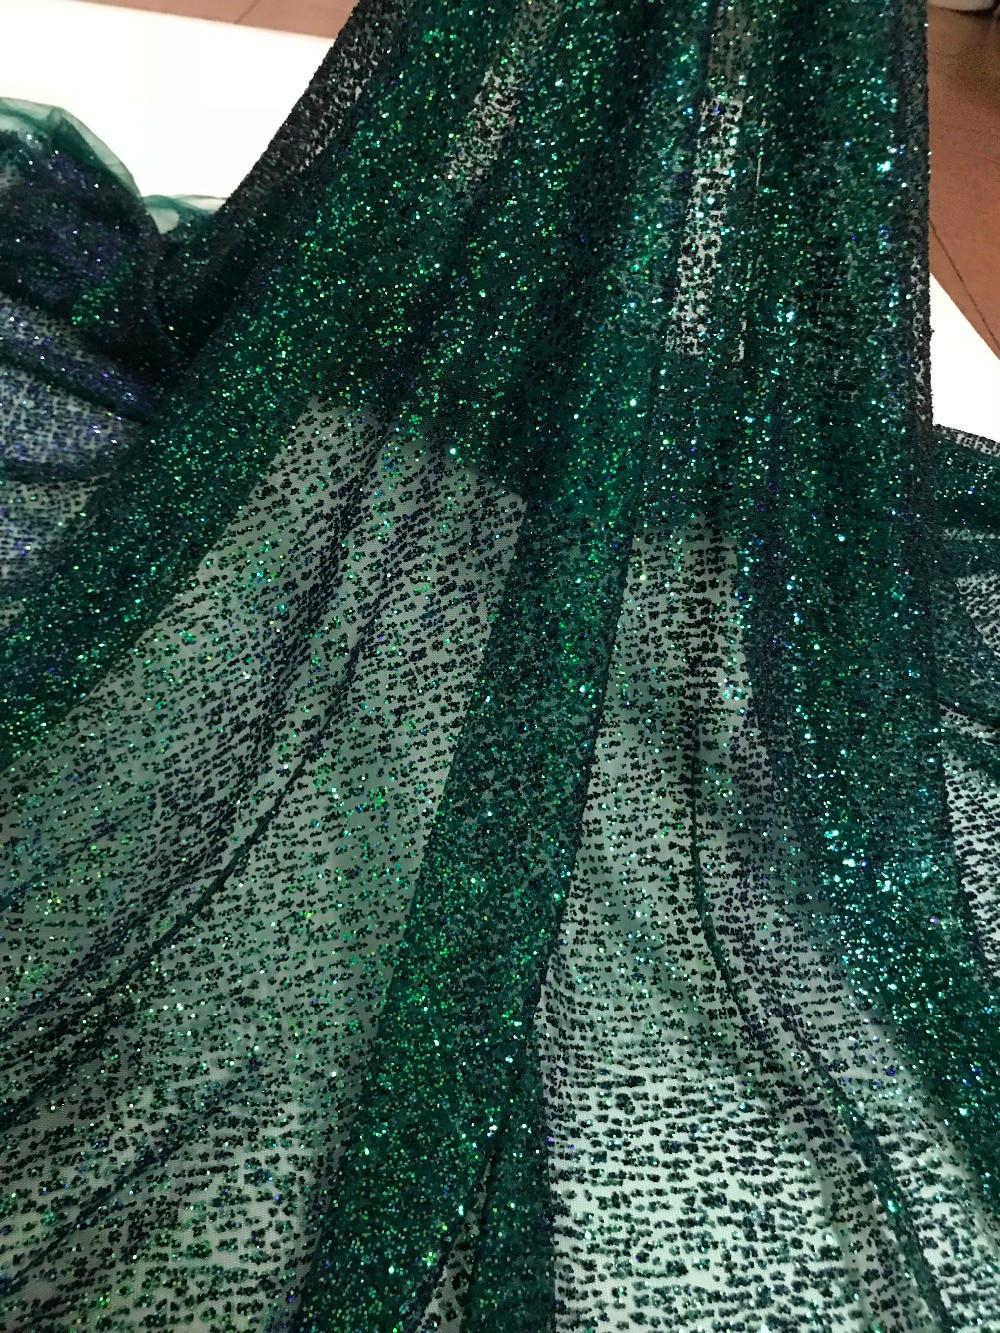 Tulle ลูกไม้ glued glitter แฟชั่น CiCi 101907 แอฟริกัน glitter ลูกไม้ผ้าสำหรับชุดปาร์ตี้ 5 หลา/lot-ใน ลูกไม้ จาก บ้านและสวน บน   1